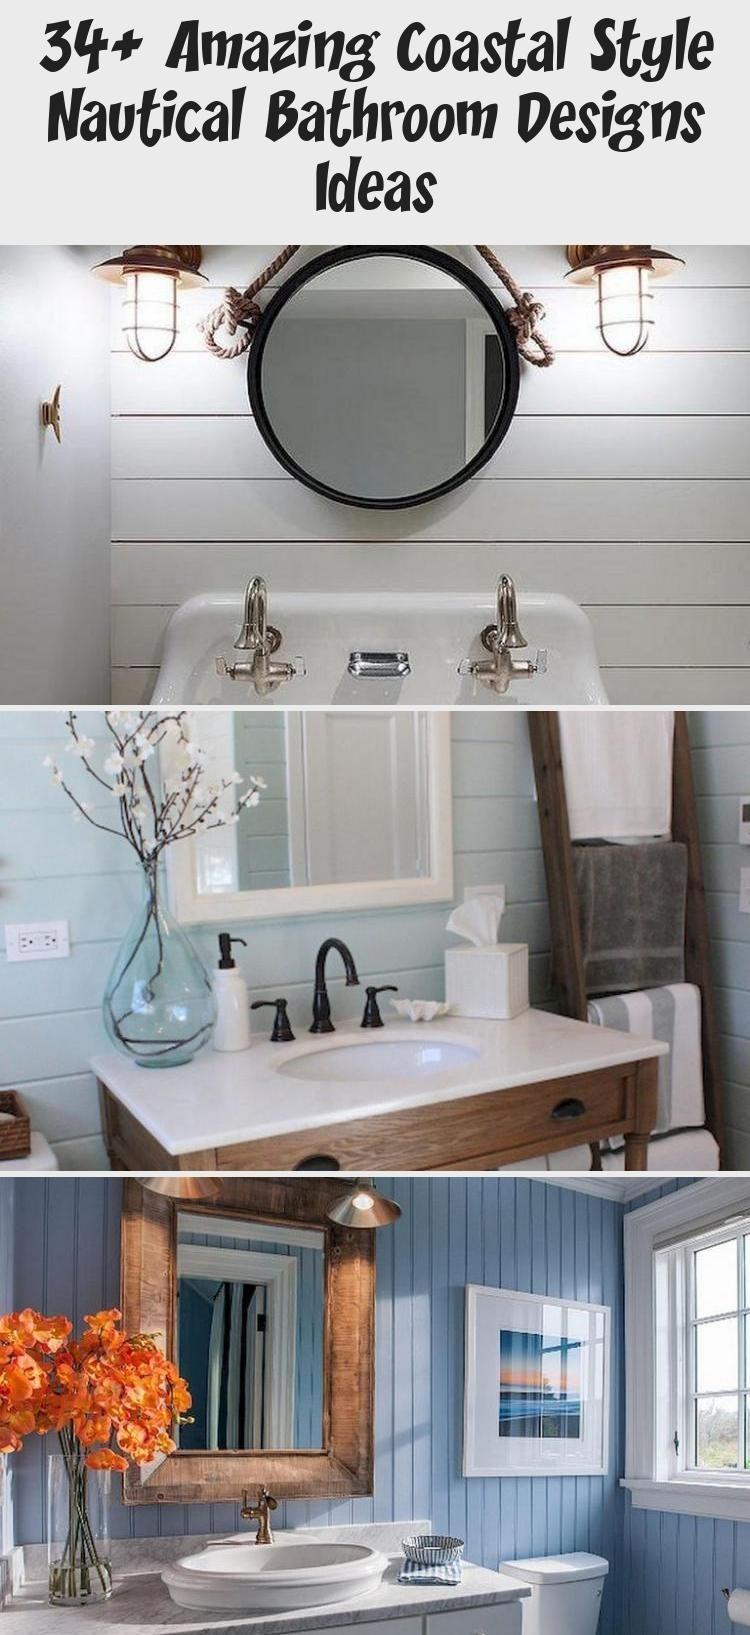 A Comprehensive Overview On Home Decoration In 2020 Nautical Bathroom Design Ideas Coastal Bathroom Decor Rustic Bathrooms